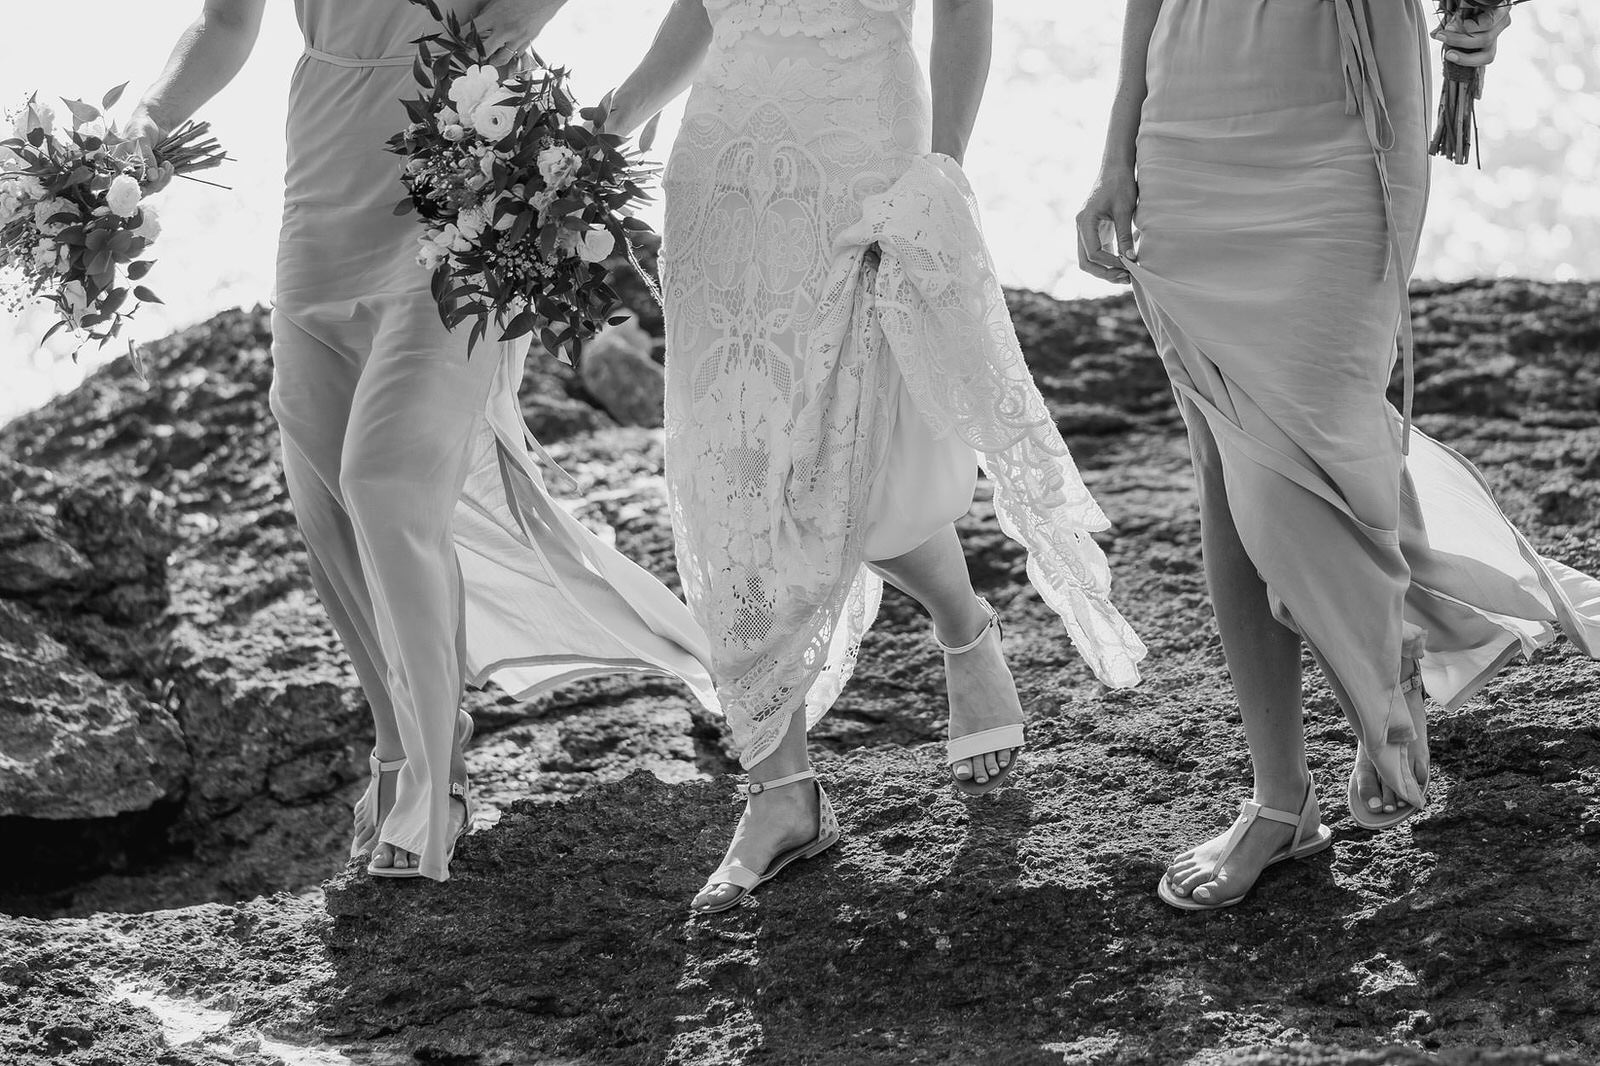 newfound-hai-tide-nusa-lembongan-bali-wedding-photographers-101